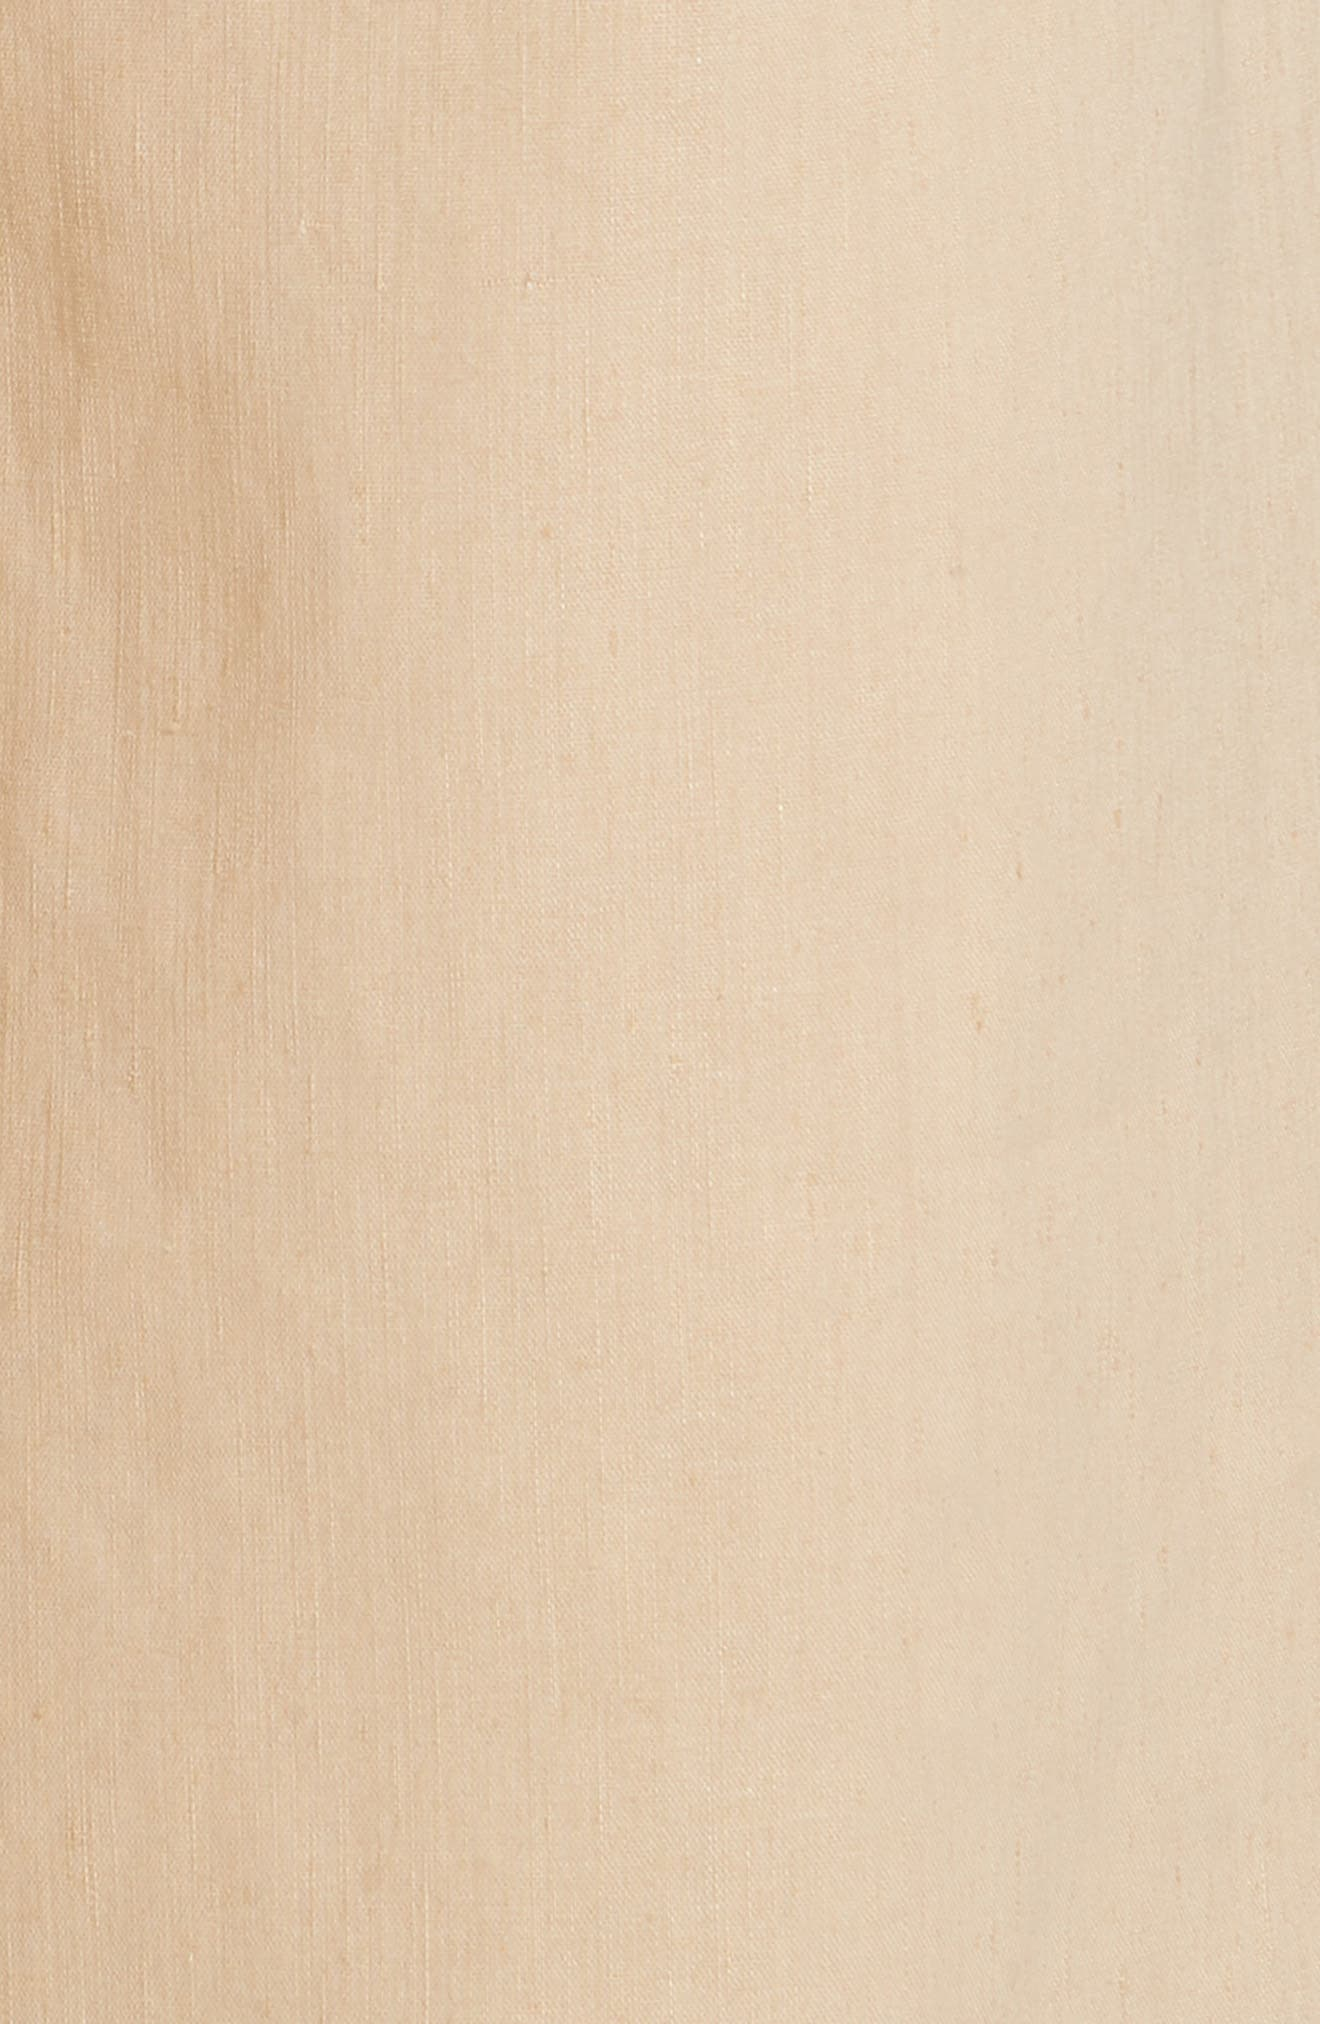 High Rise Linen Blend Culottes,                             Alternate thumbnail 5, color,                             KHAKI